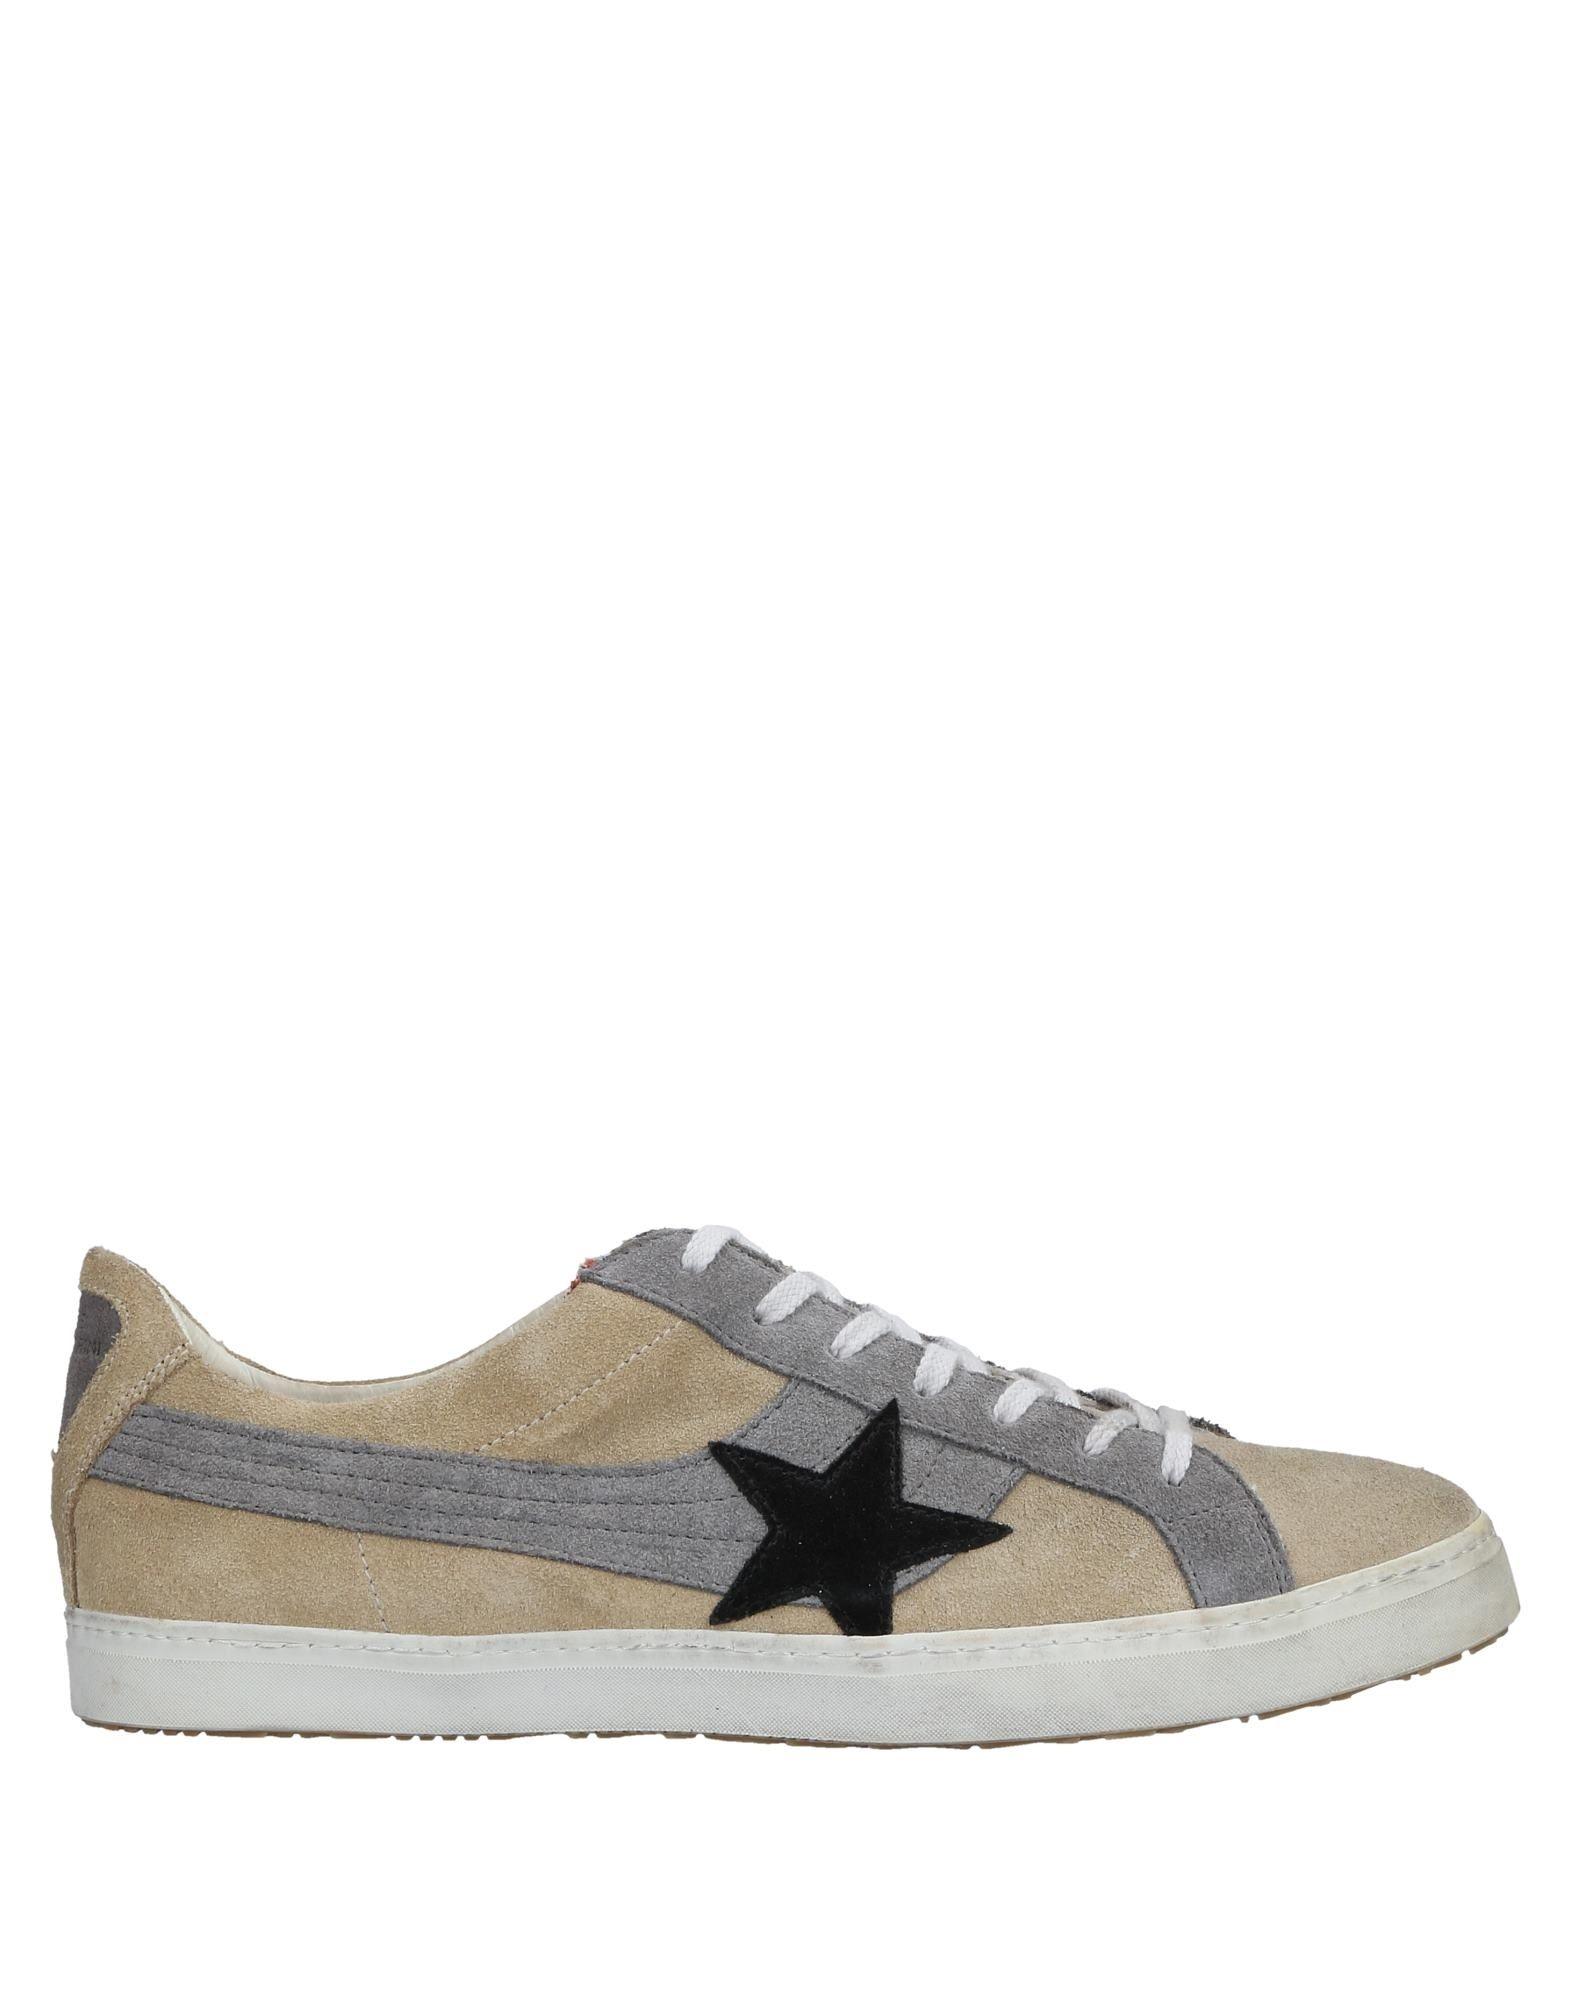 Daniele Alessandrini Sneakers Herren  11534433XC